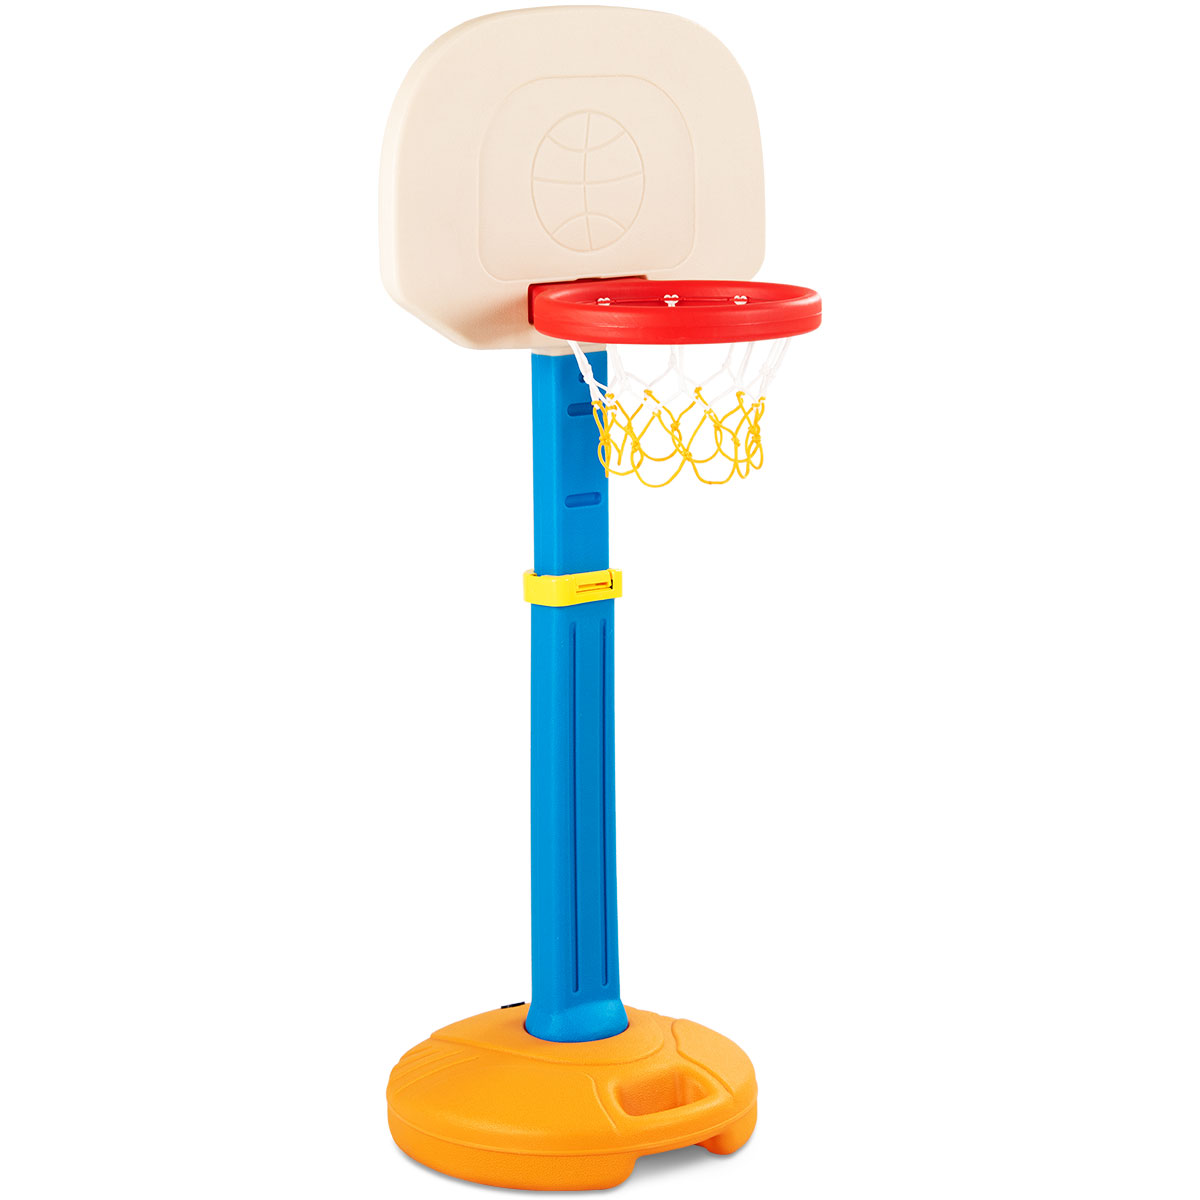 Adjustable Children's Basketball Stand